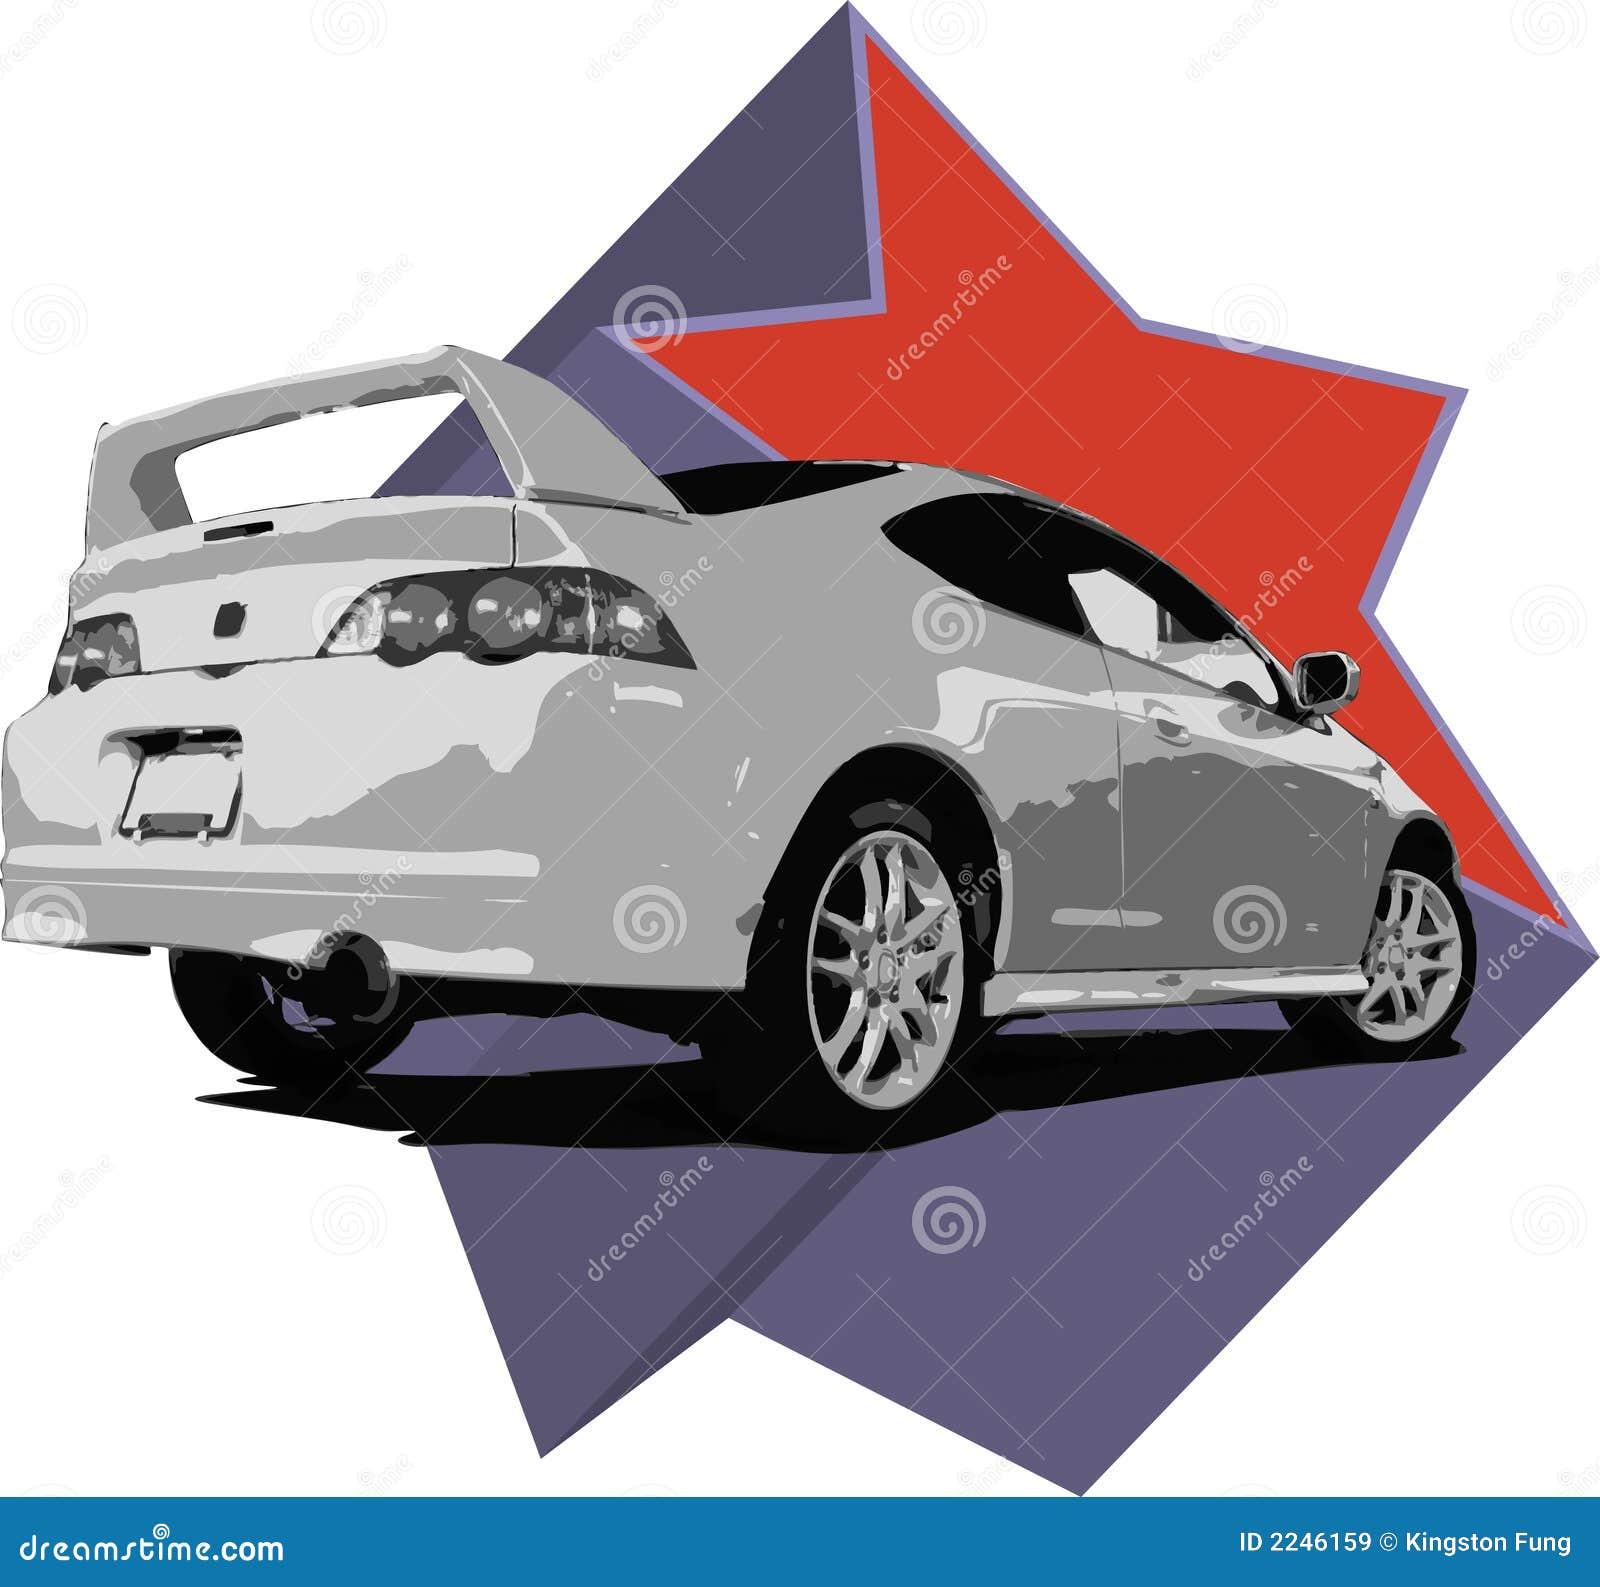 Acura RSX Illustration Stock Vector. Illustration Of